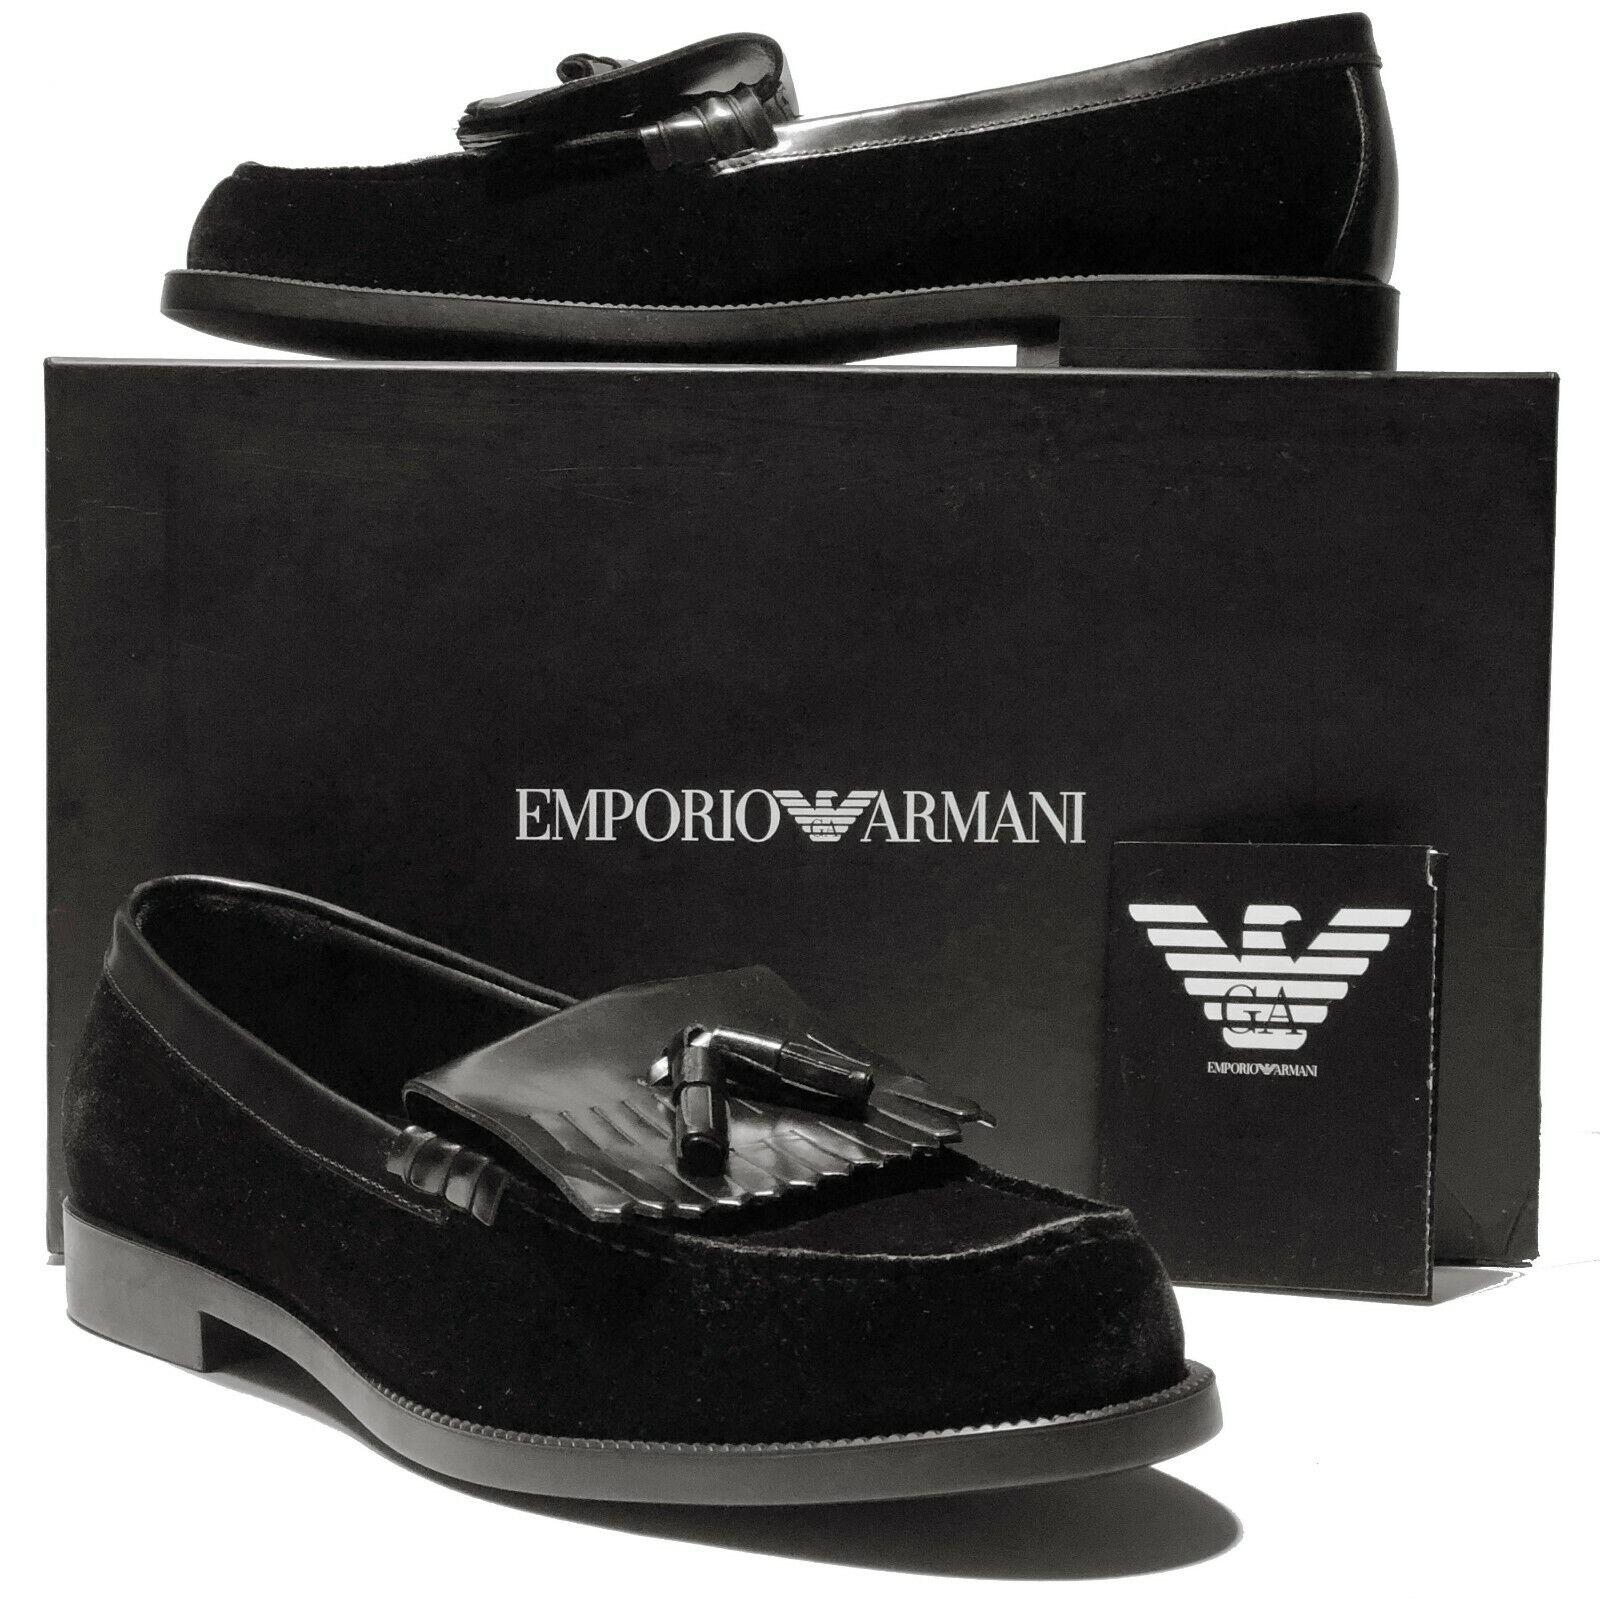 nouveau EMPORIO ARhommeI cuir noir velours   Tassel 10 43 Mocassins Chaussures hommes